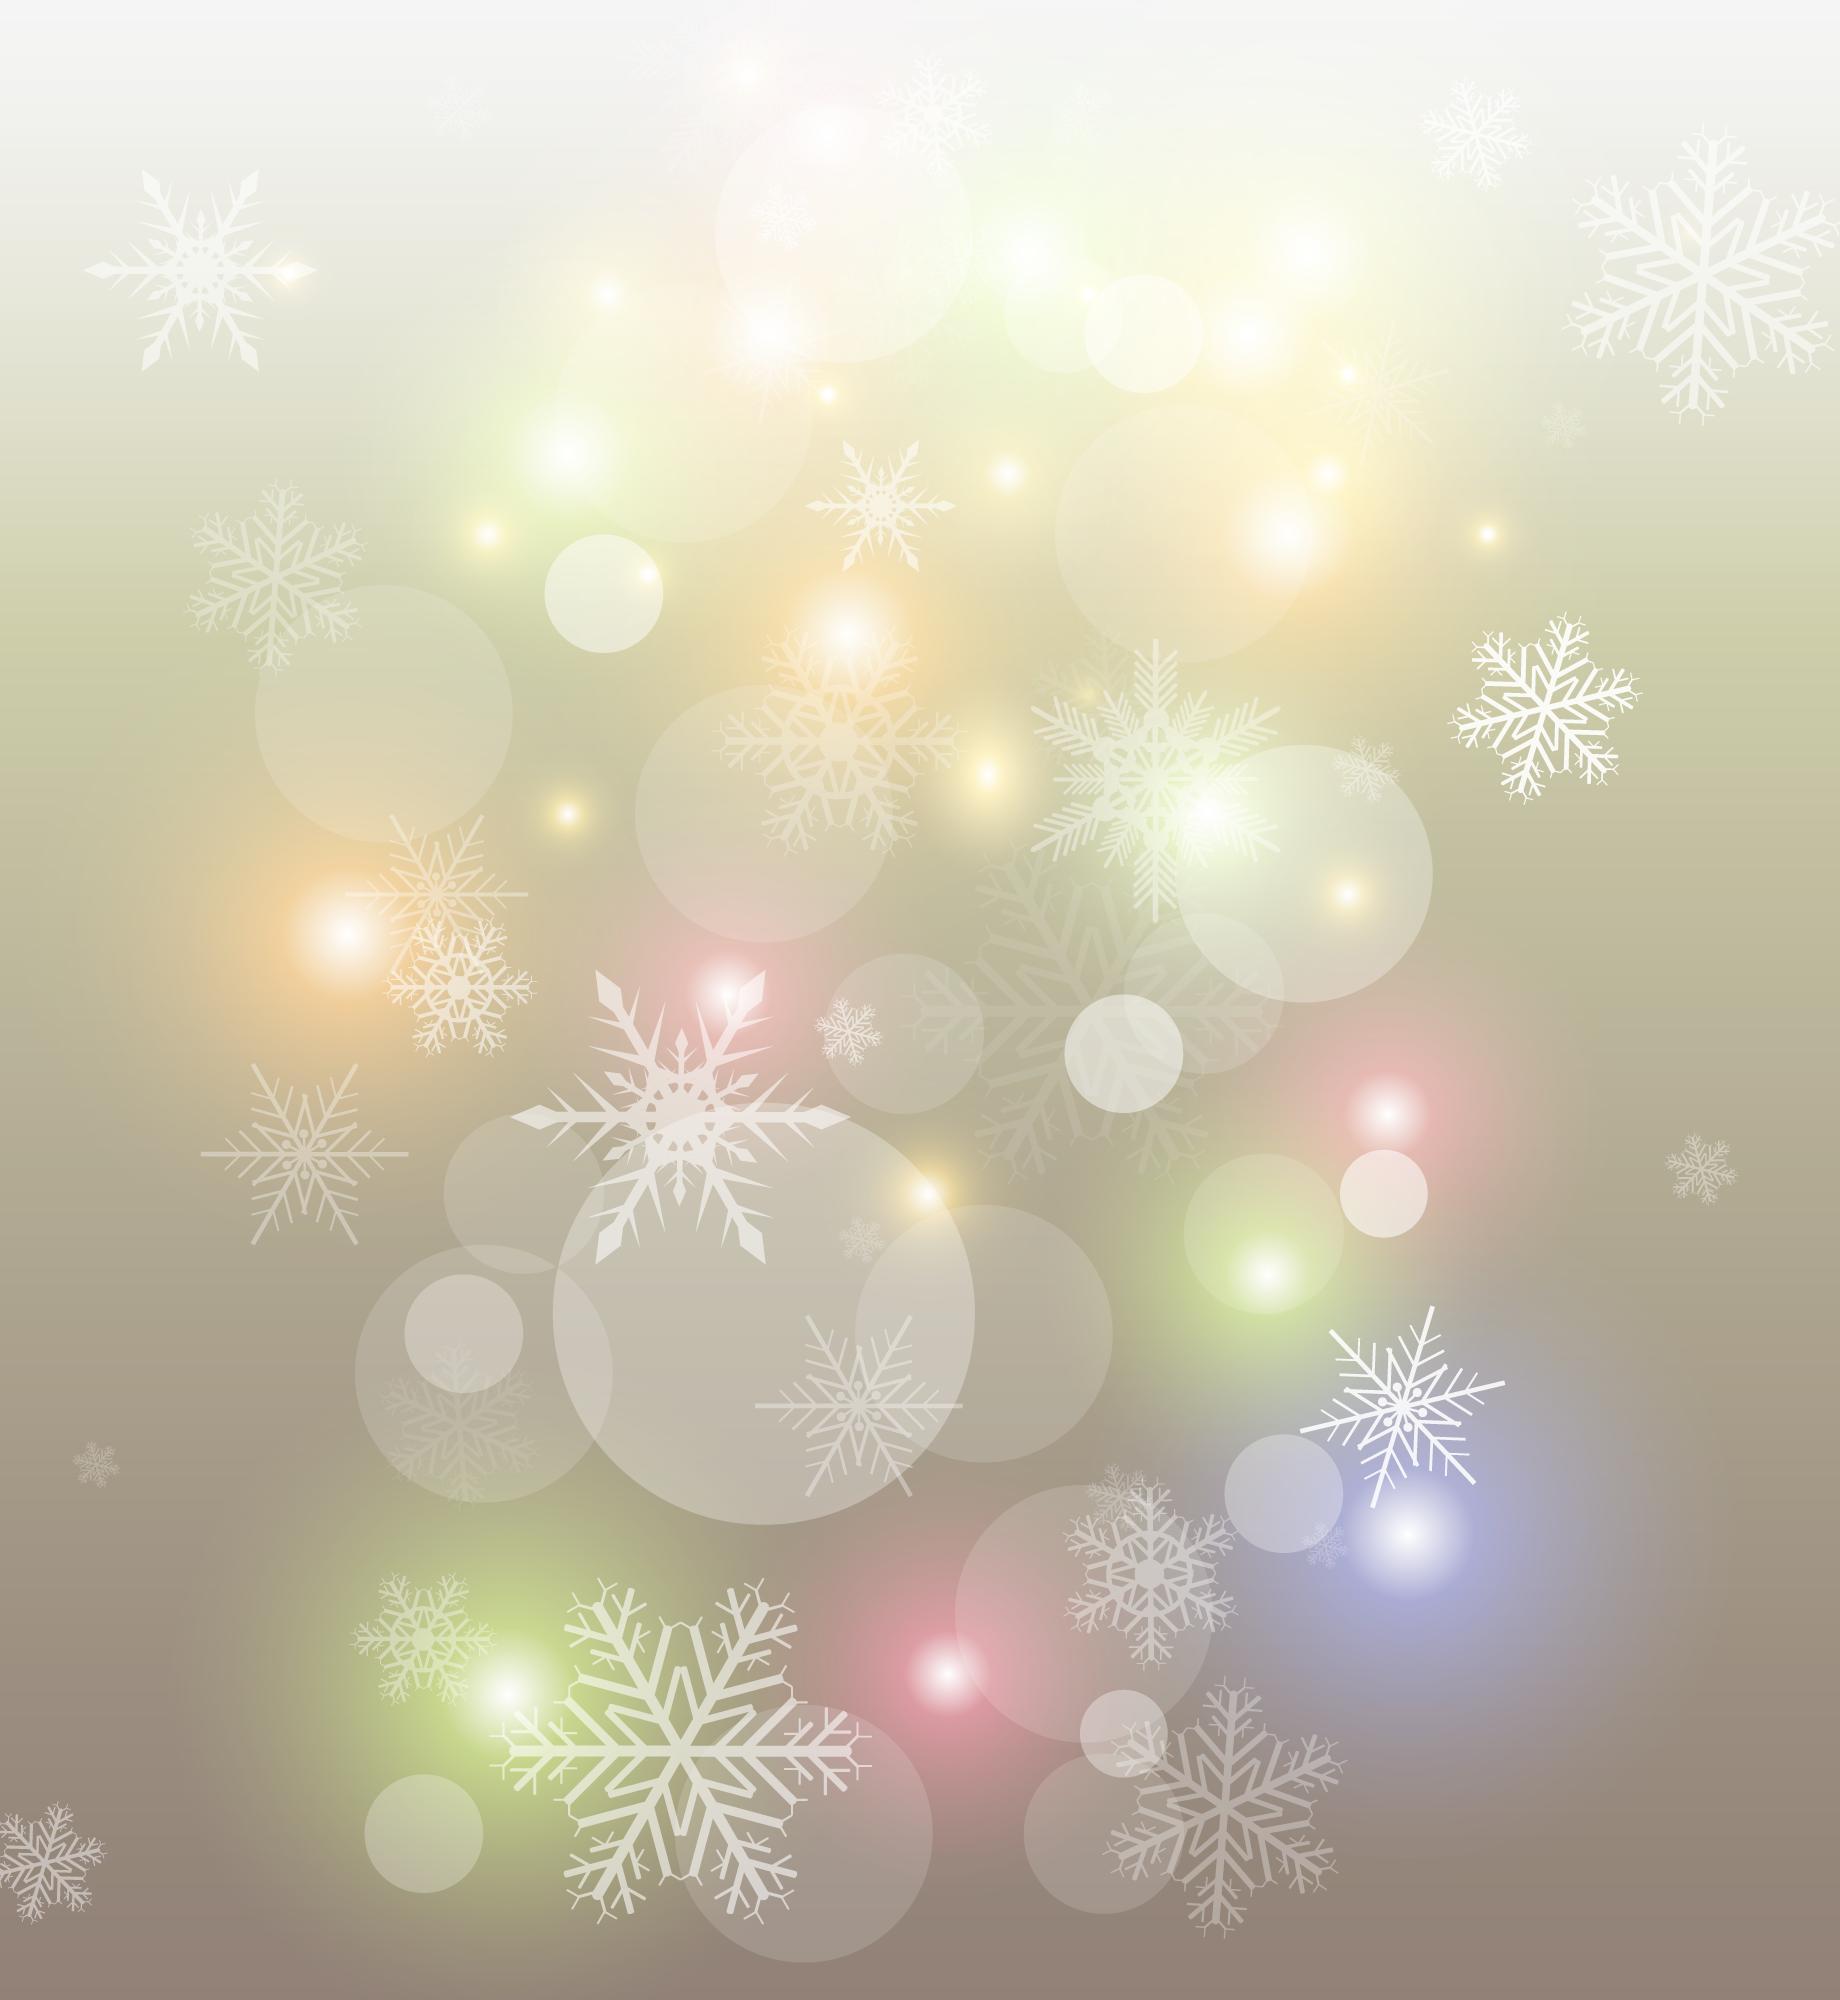 зимний новогодний фон 11